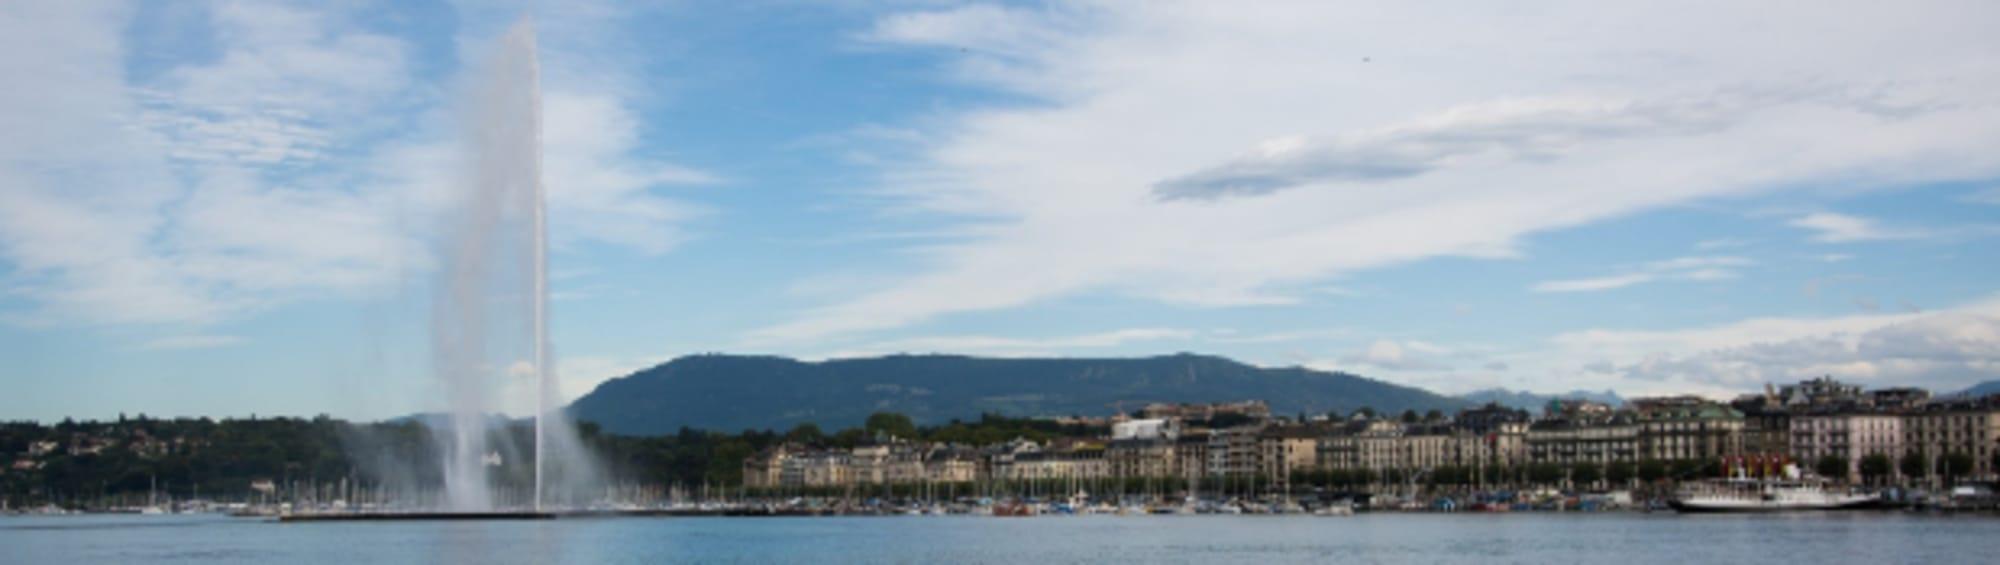 Geneva - the 'Global Village'